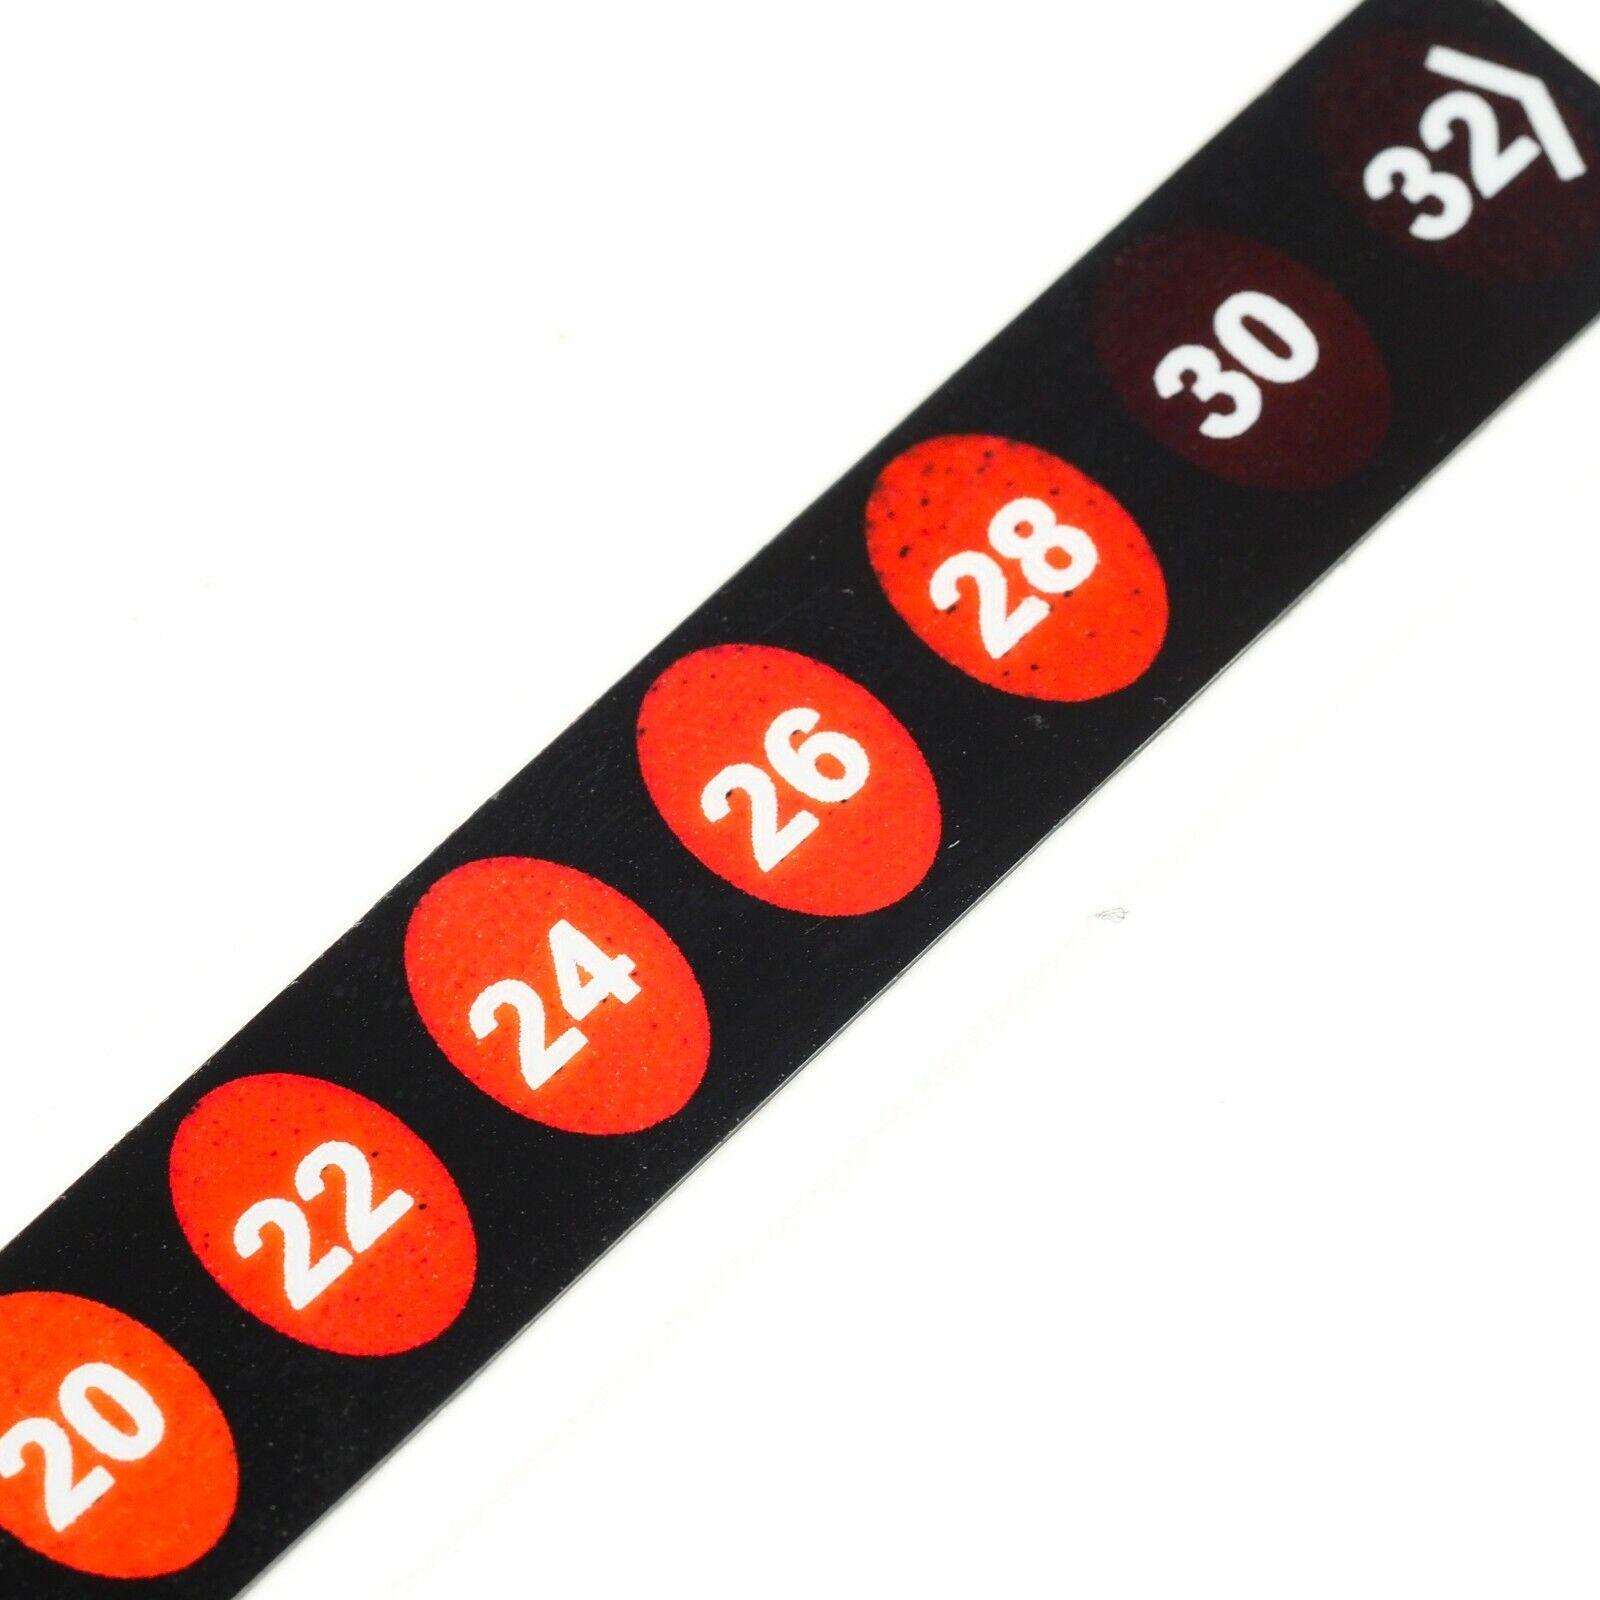 10 - 32 Degree Room Temperature Sticker Label 12 Level Indicator Temp Strip Heat